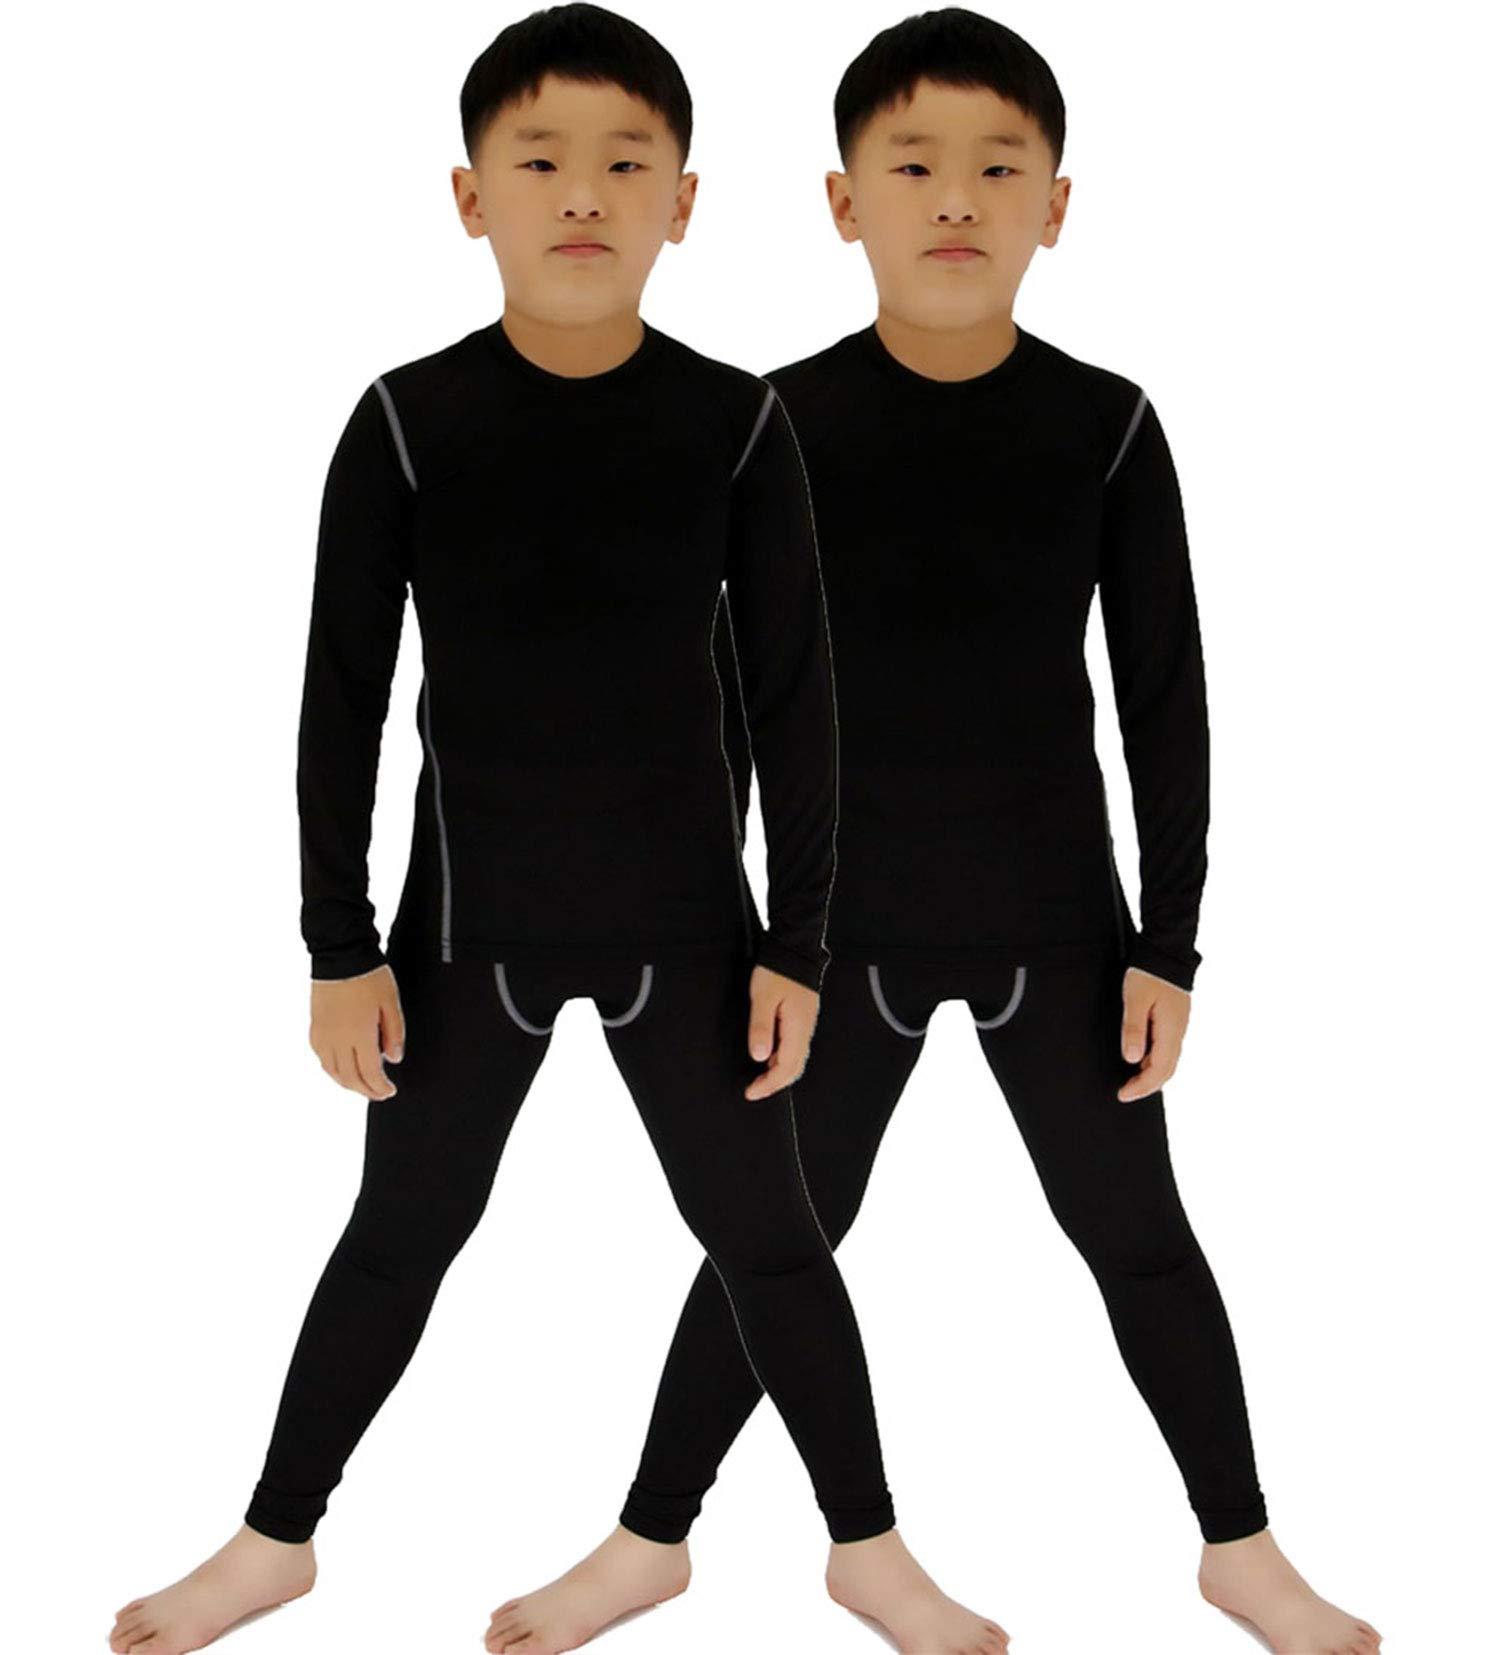 LANBAOSI 2 Packs Boys & Girls Long Sleeve Compression Shirts and Pants Set Black